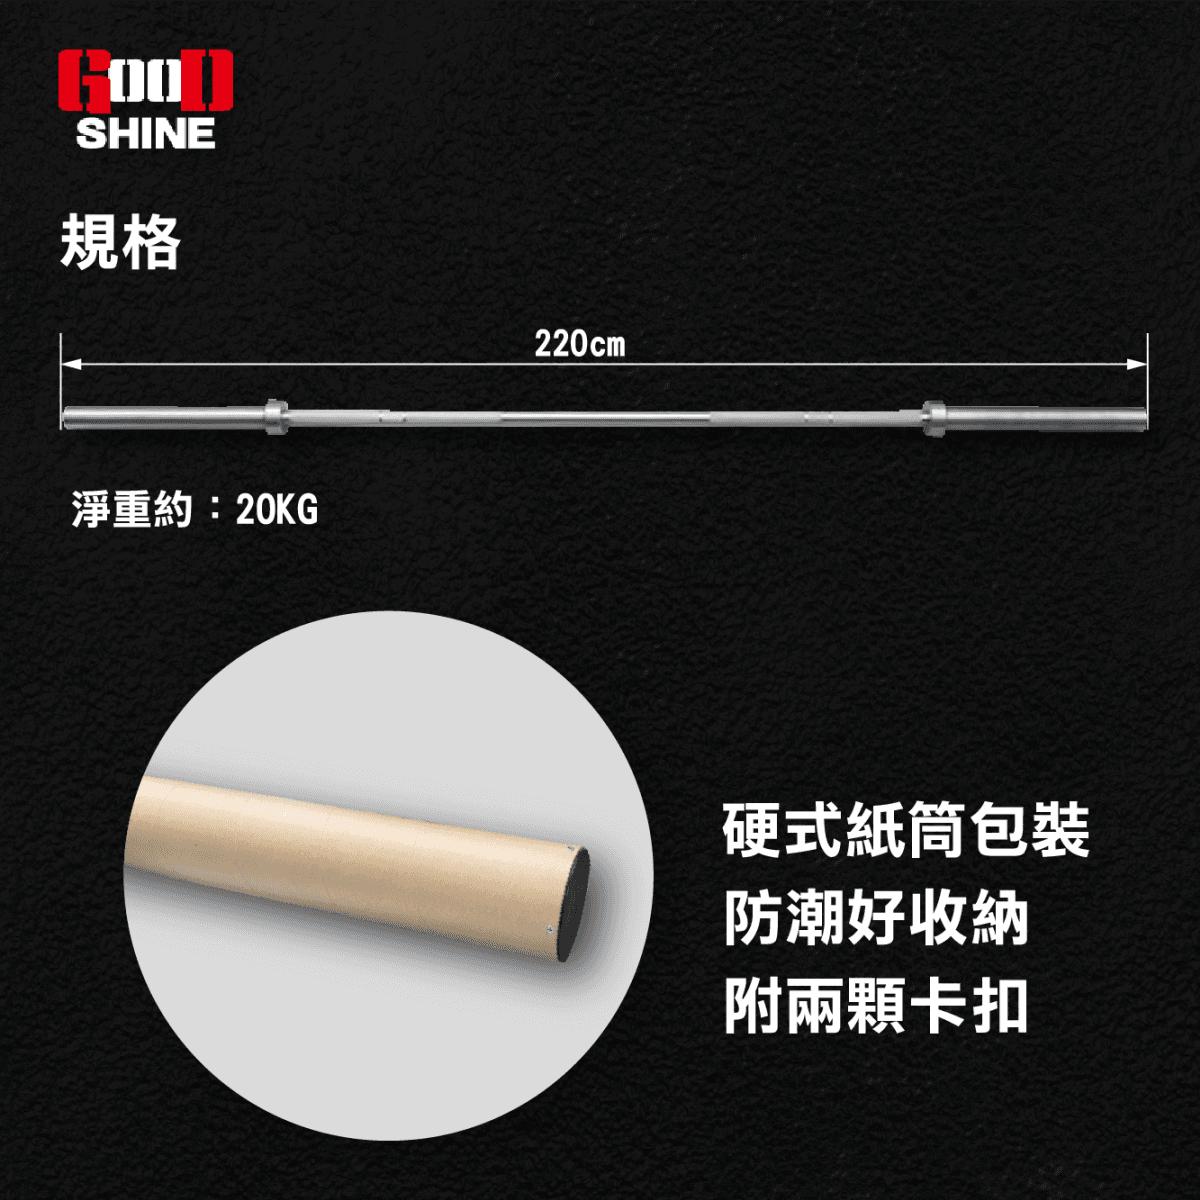 【GOOD SHINE】 奧林匹克槓 長度220CM 直徑5CM 重量20KG 5